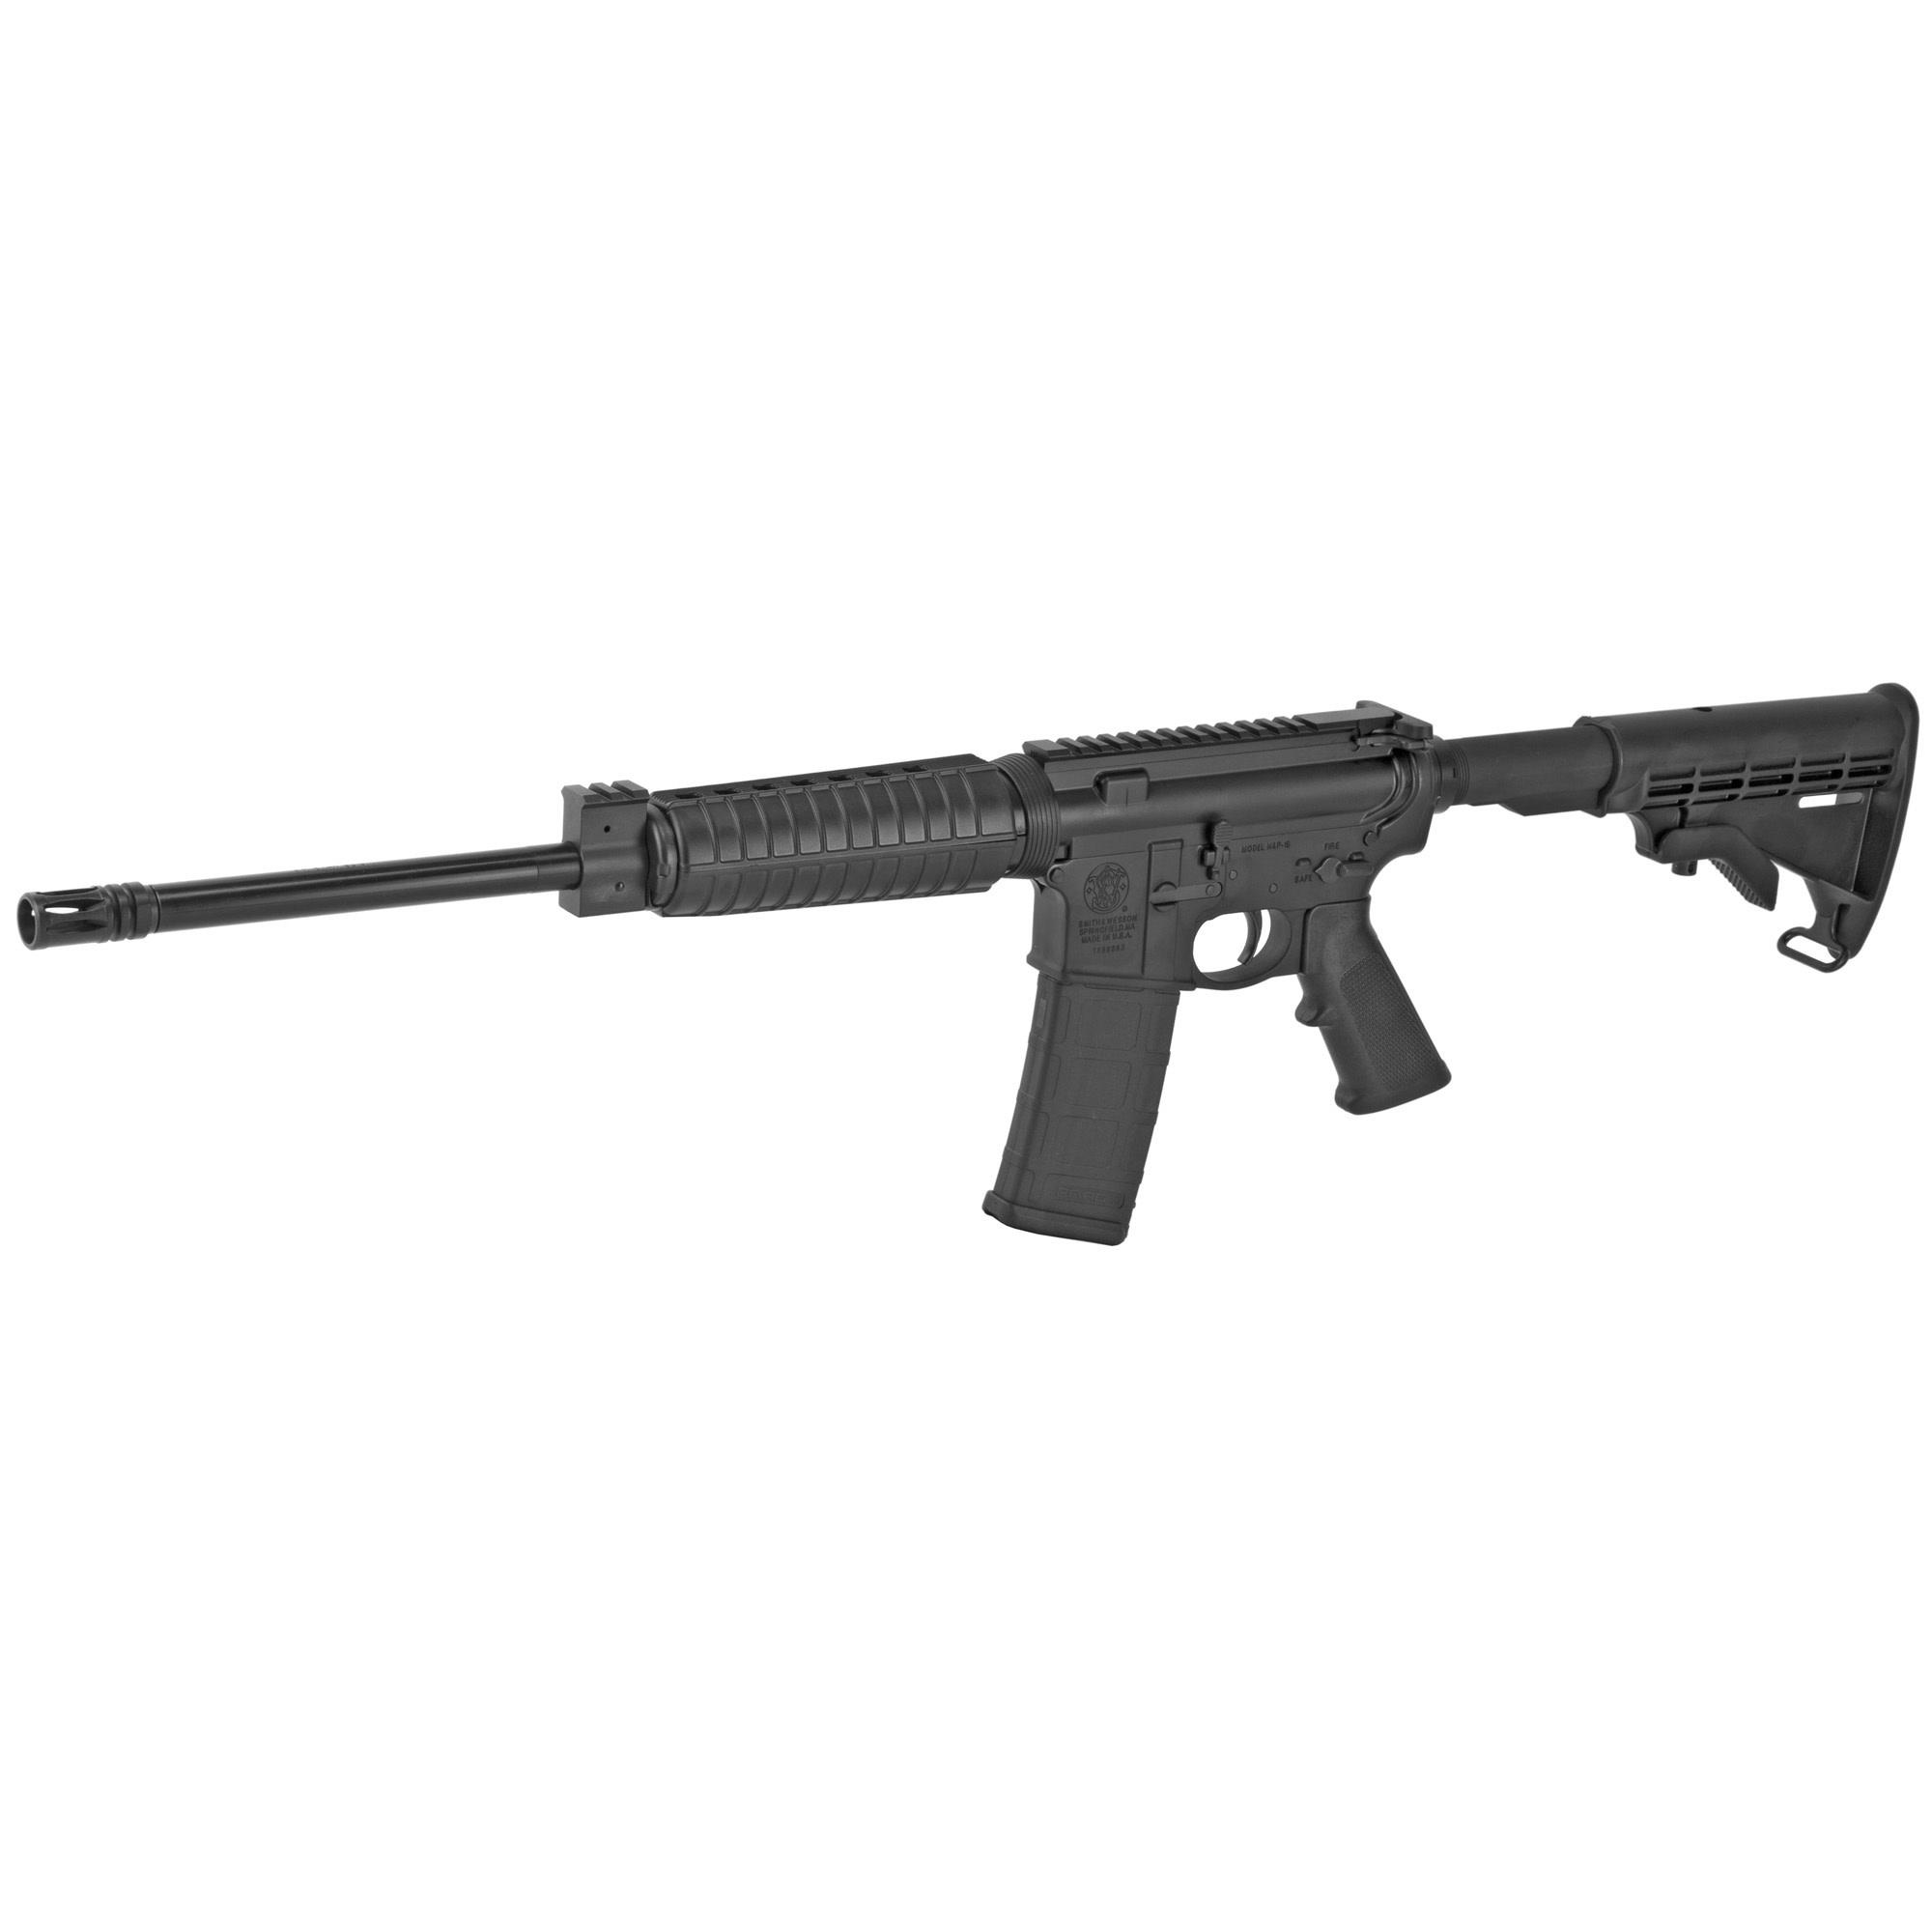 Smith & Wesson, M&P 15, Sport II, Optics Ready, Semi-automatic, AR, 556NATO, 16'' Barrel, Black Finish, Black Collapsible Stock, 1 Mag, 30Rd, Flattop